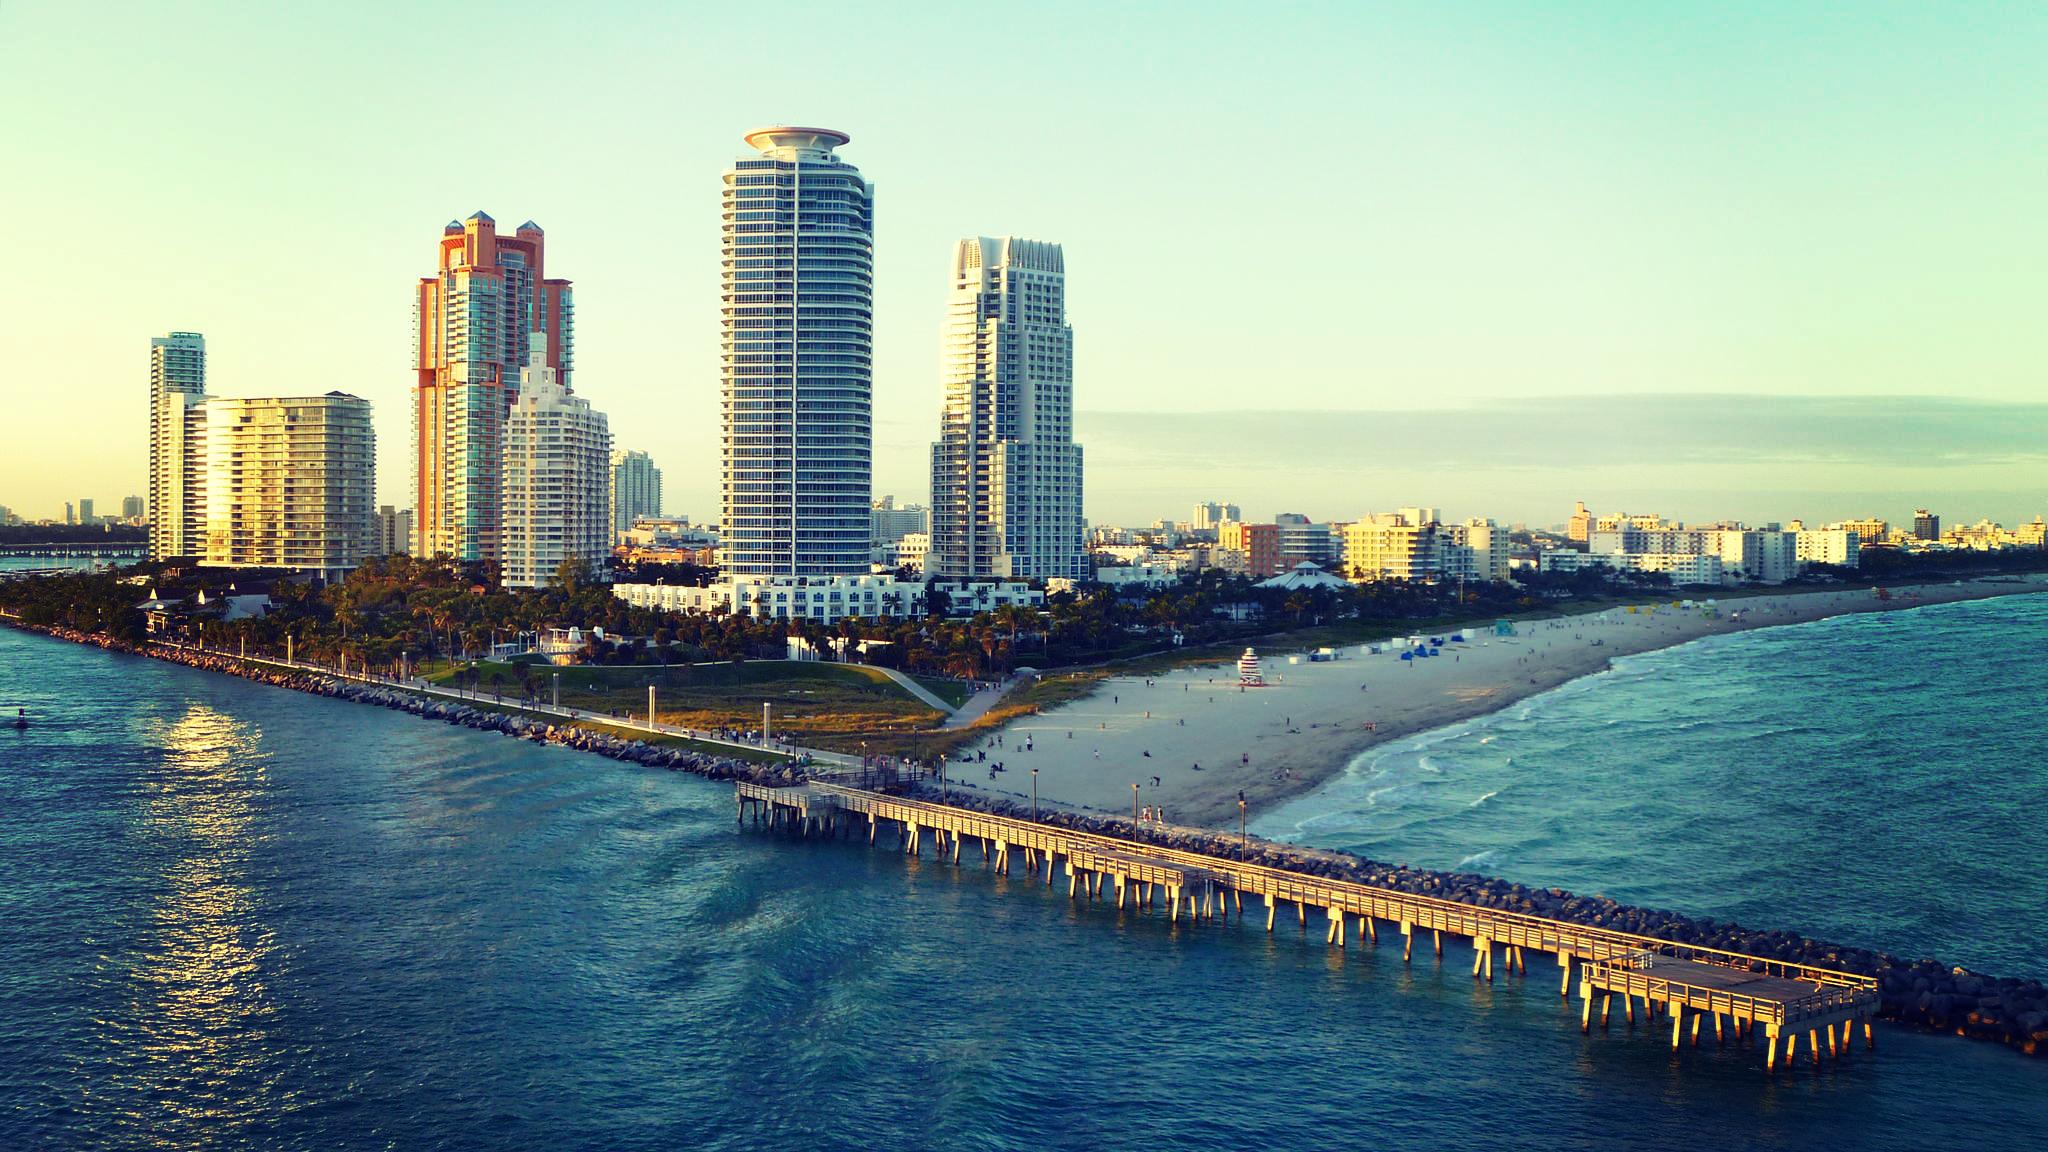 miami miami beach ocean beach wallpapers photos pictures 2048x1152